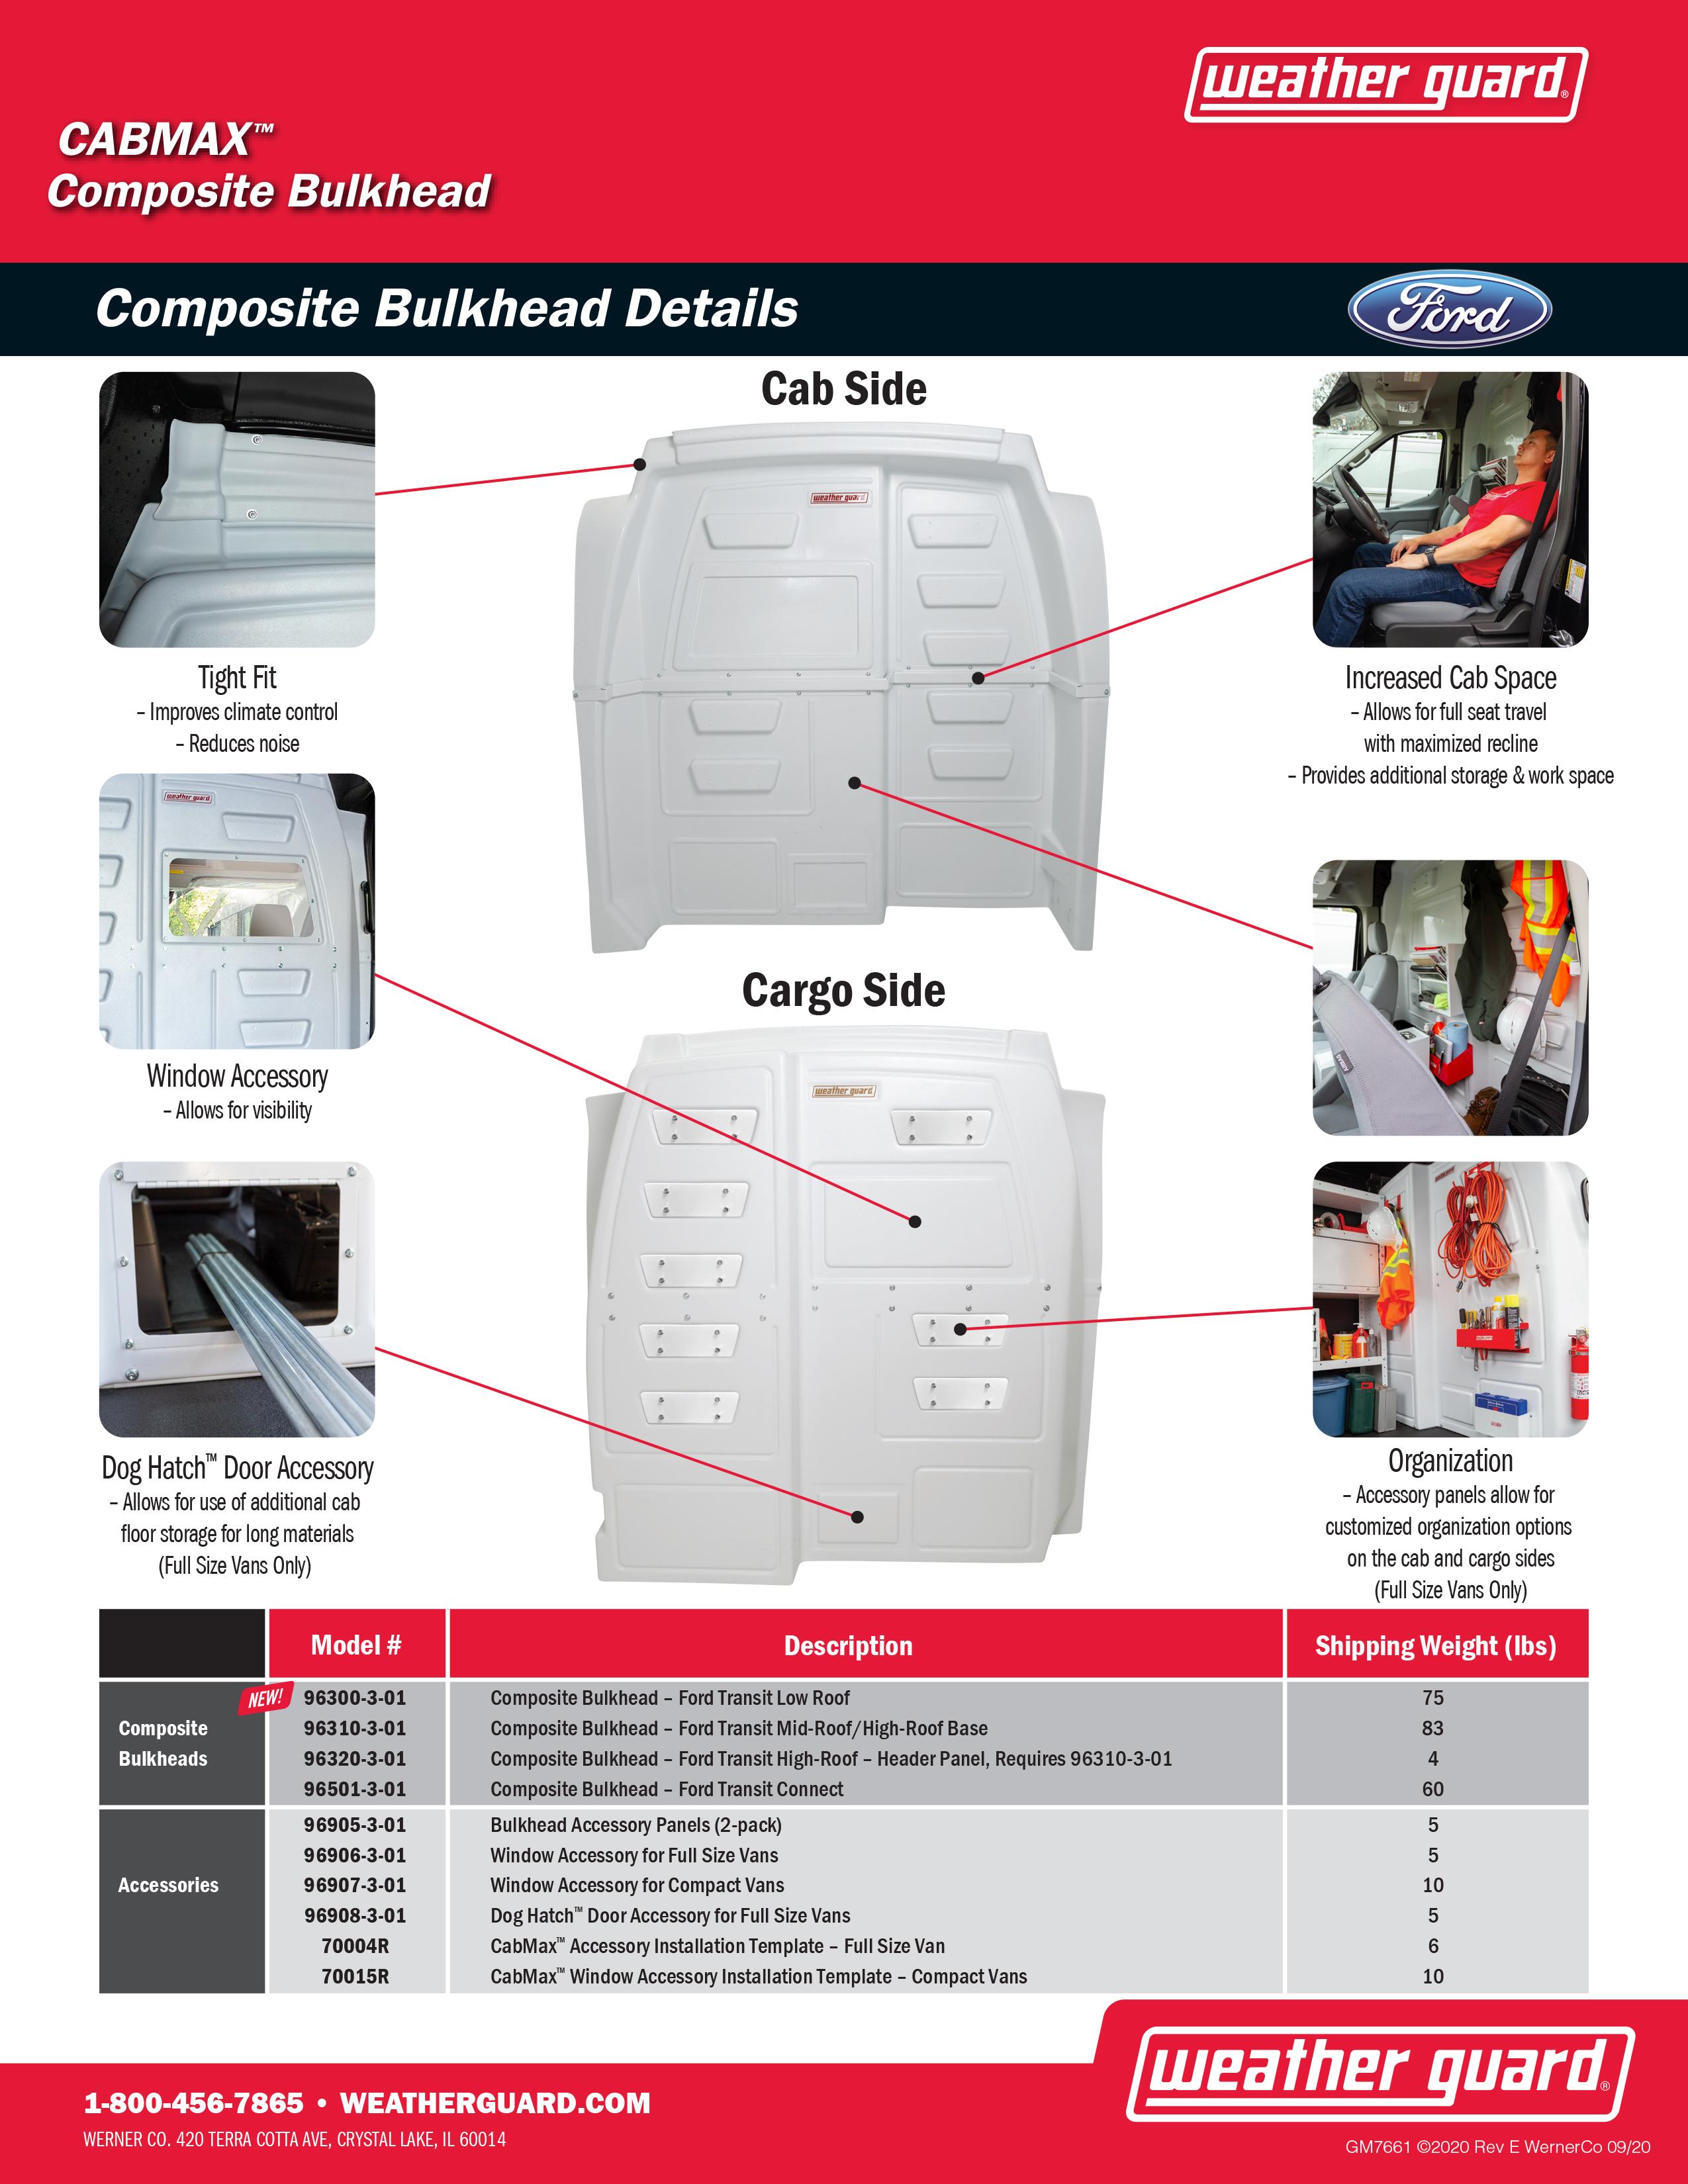 gm7661-composite-bulkhead-ss-hires-2.jpg